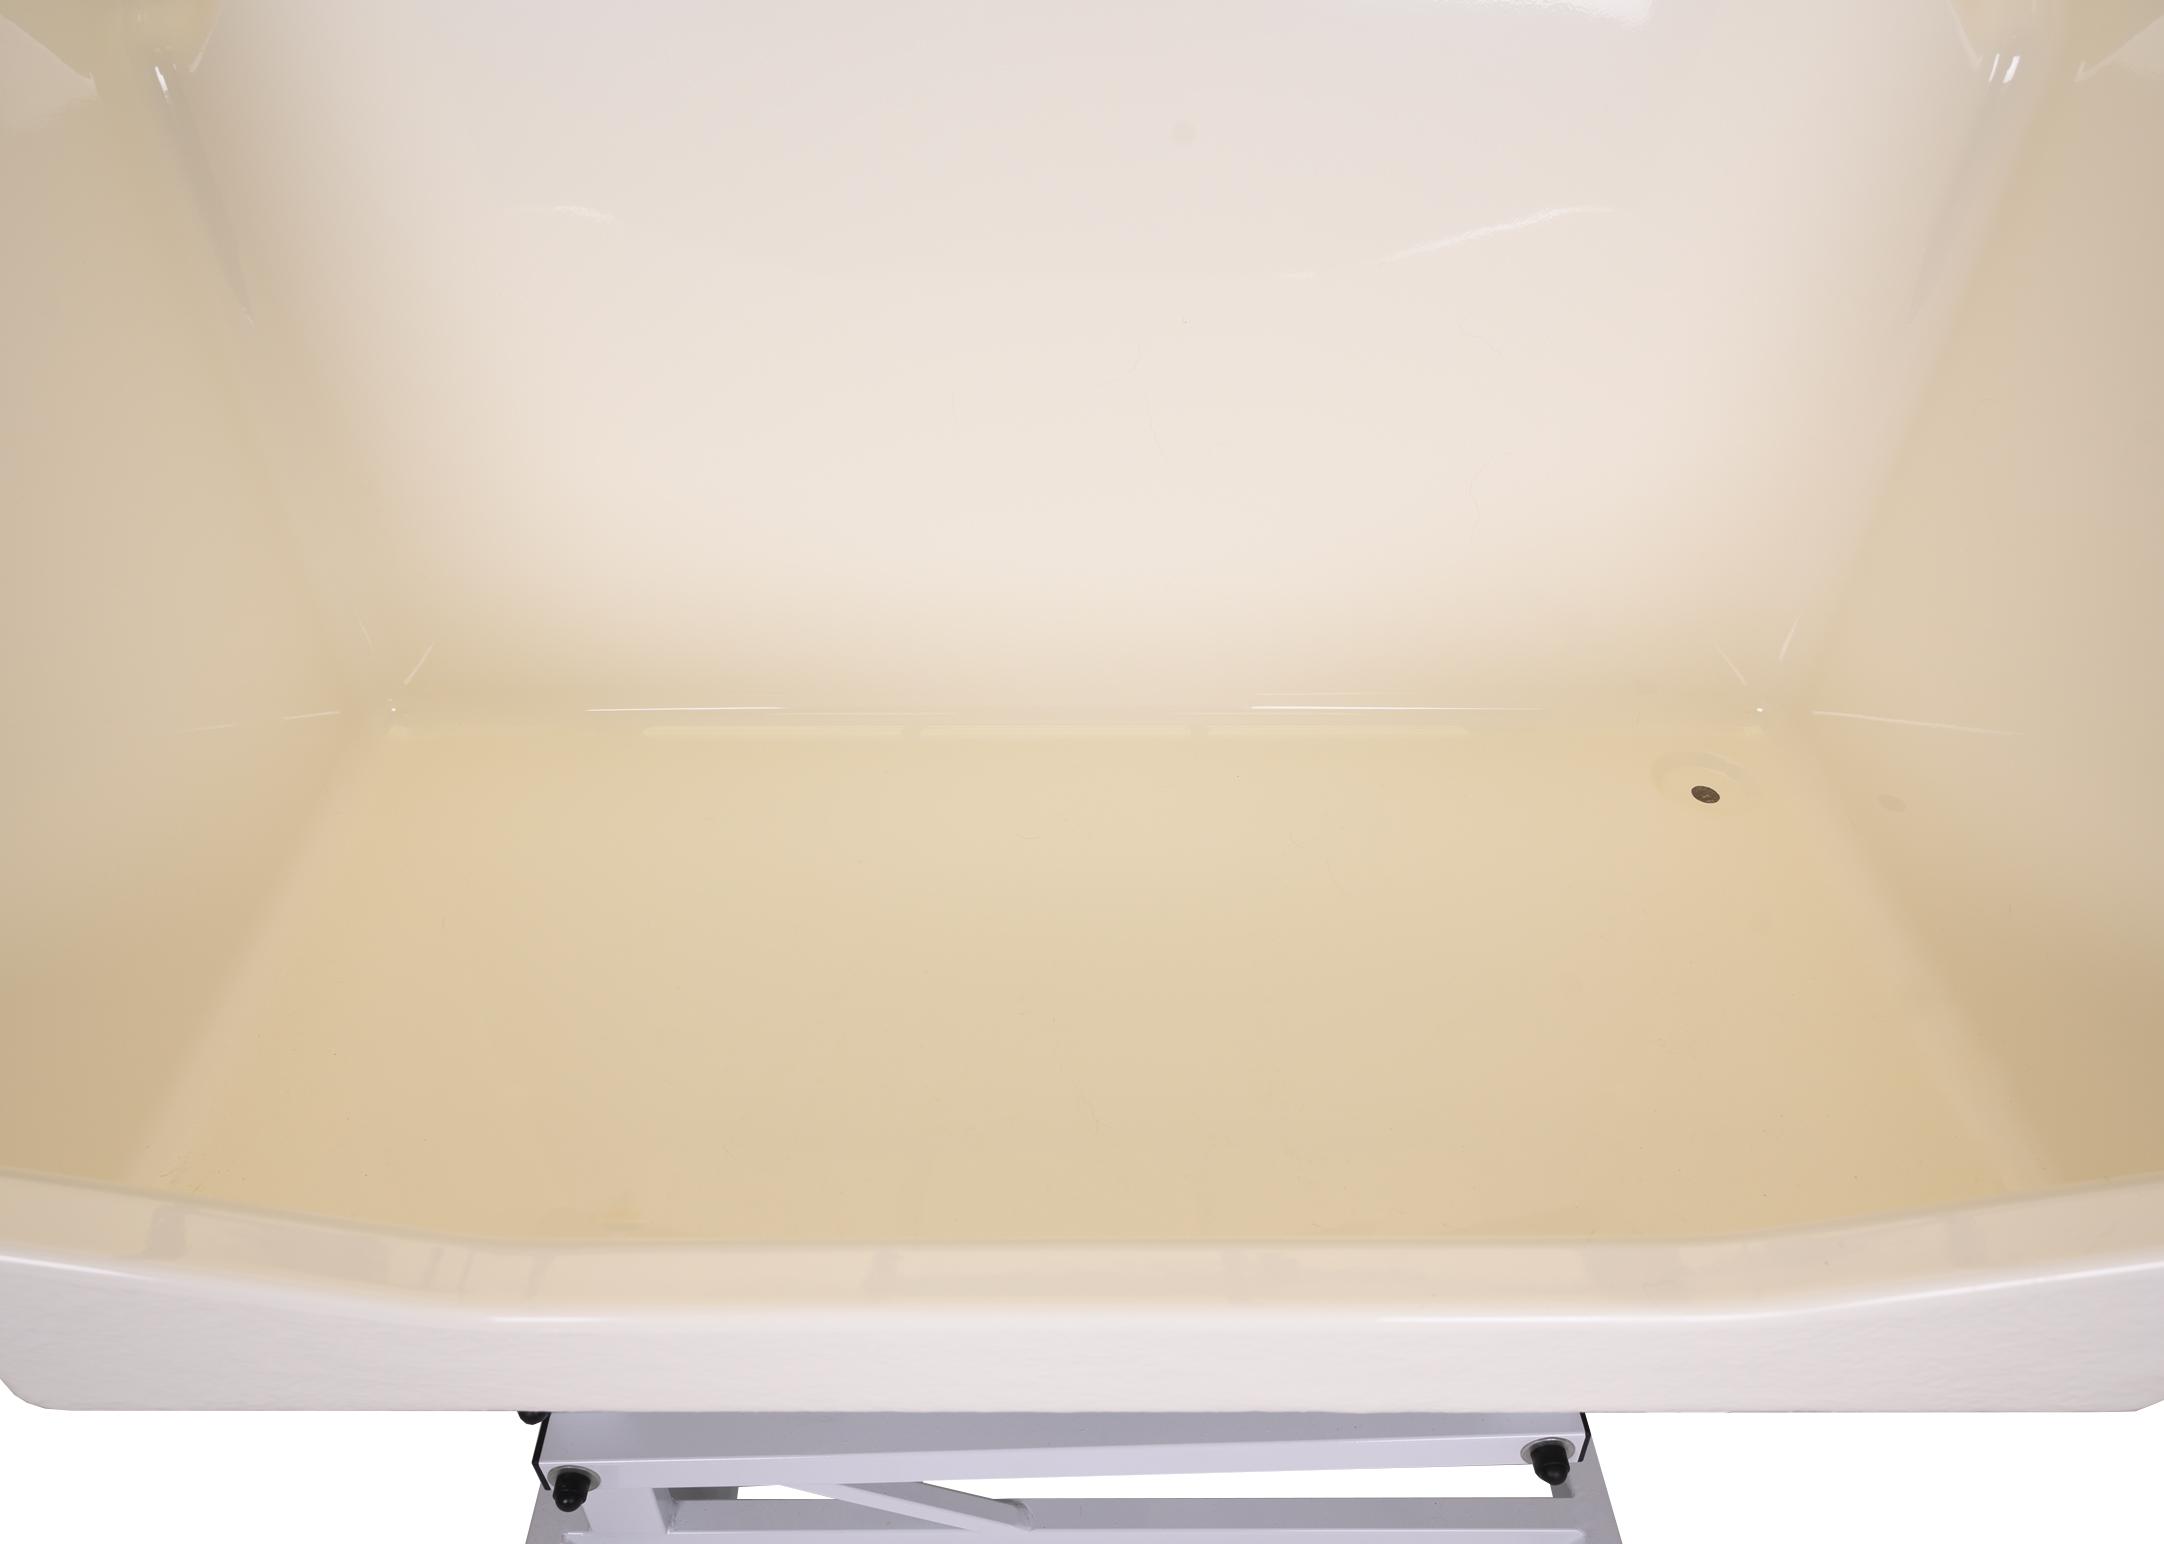 Groom-X Atlantis Pro Bath with Electrical Height Adjustment